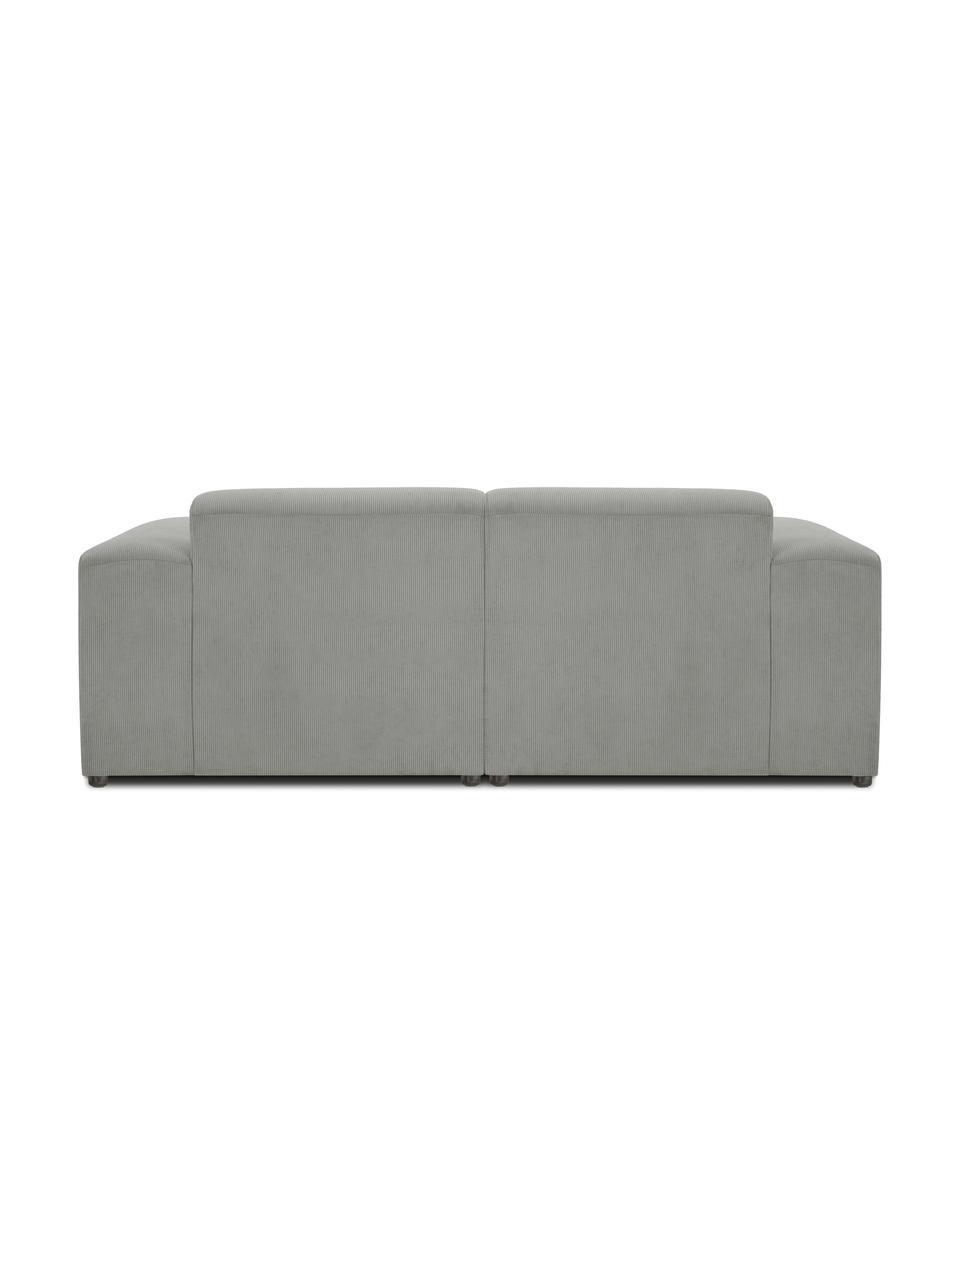 Ribfluwelen bank Melva (2-zits) in grijs, Bekleding: corduroy (92% polyester, , Frame: massief grenenhout, FSC-g, Poten: kunststof, Corduroy grijs, 198 x 101 cm